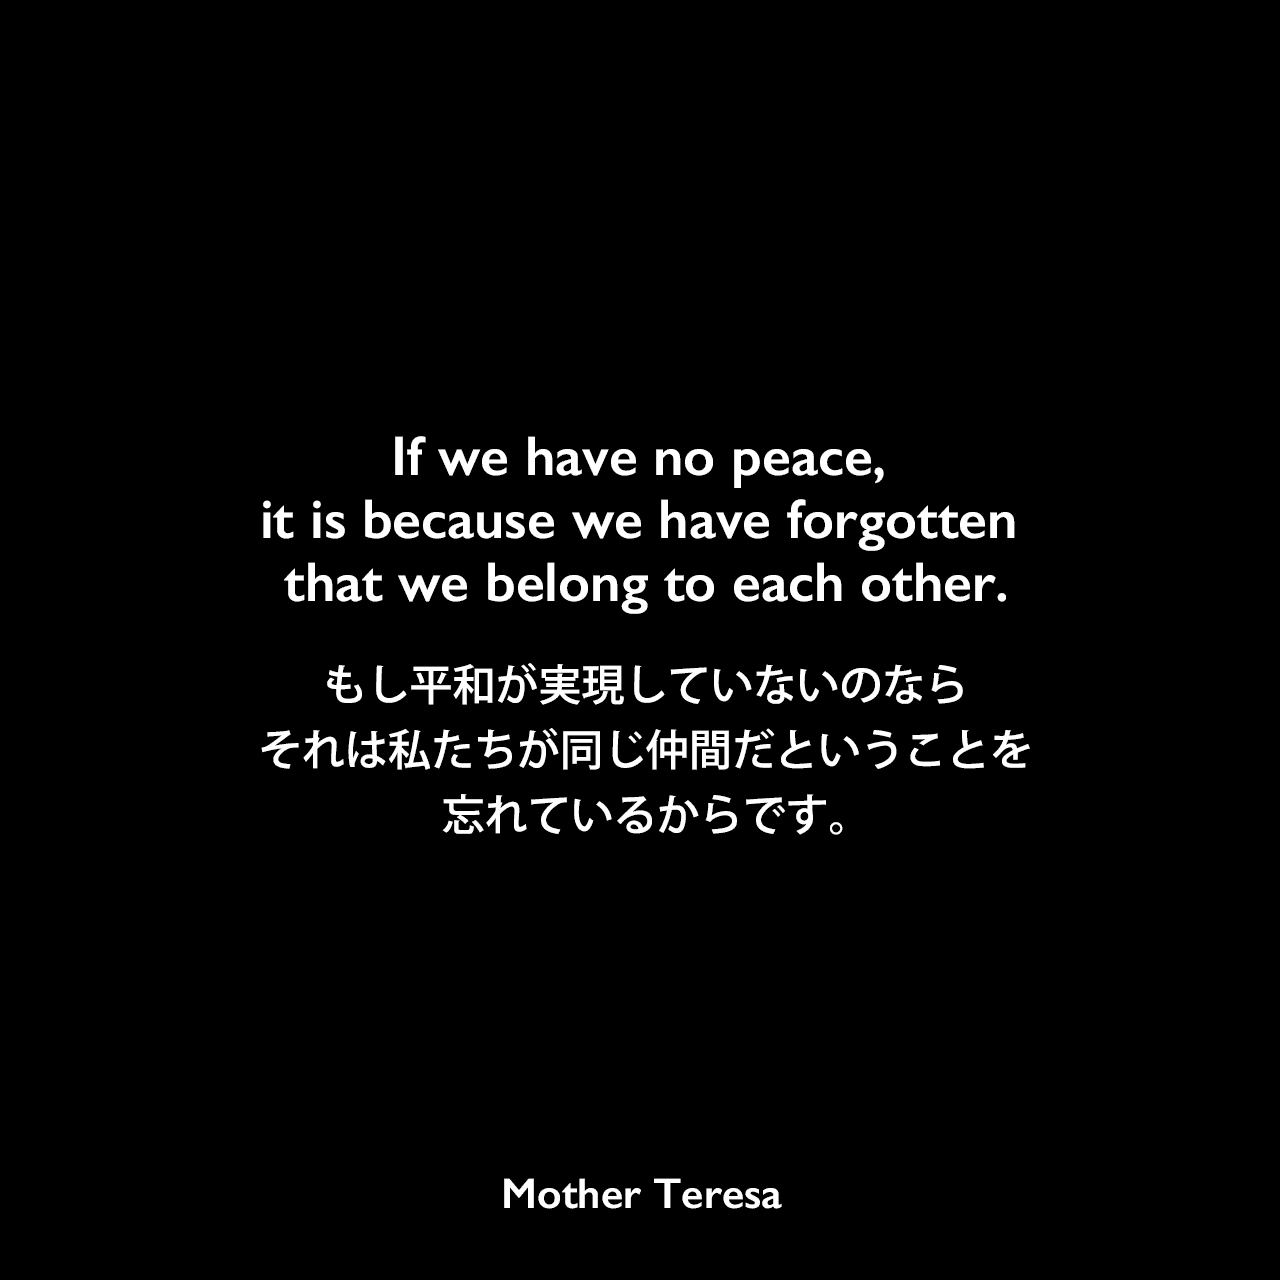 If we have no peace, it is because we have forgotten that we belong to each other.もし平和が実現していないのなら、それは私たちが同じ仲間だということを忘れているからです。- 2012年に見つかったマザー・テレサのエッセイよりMother Teresa